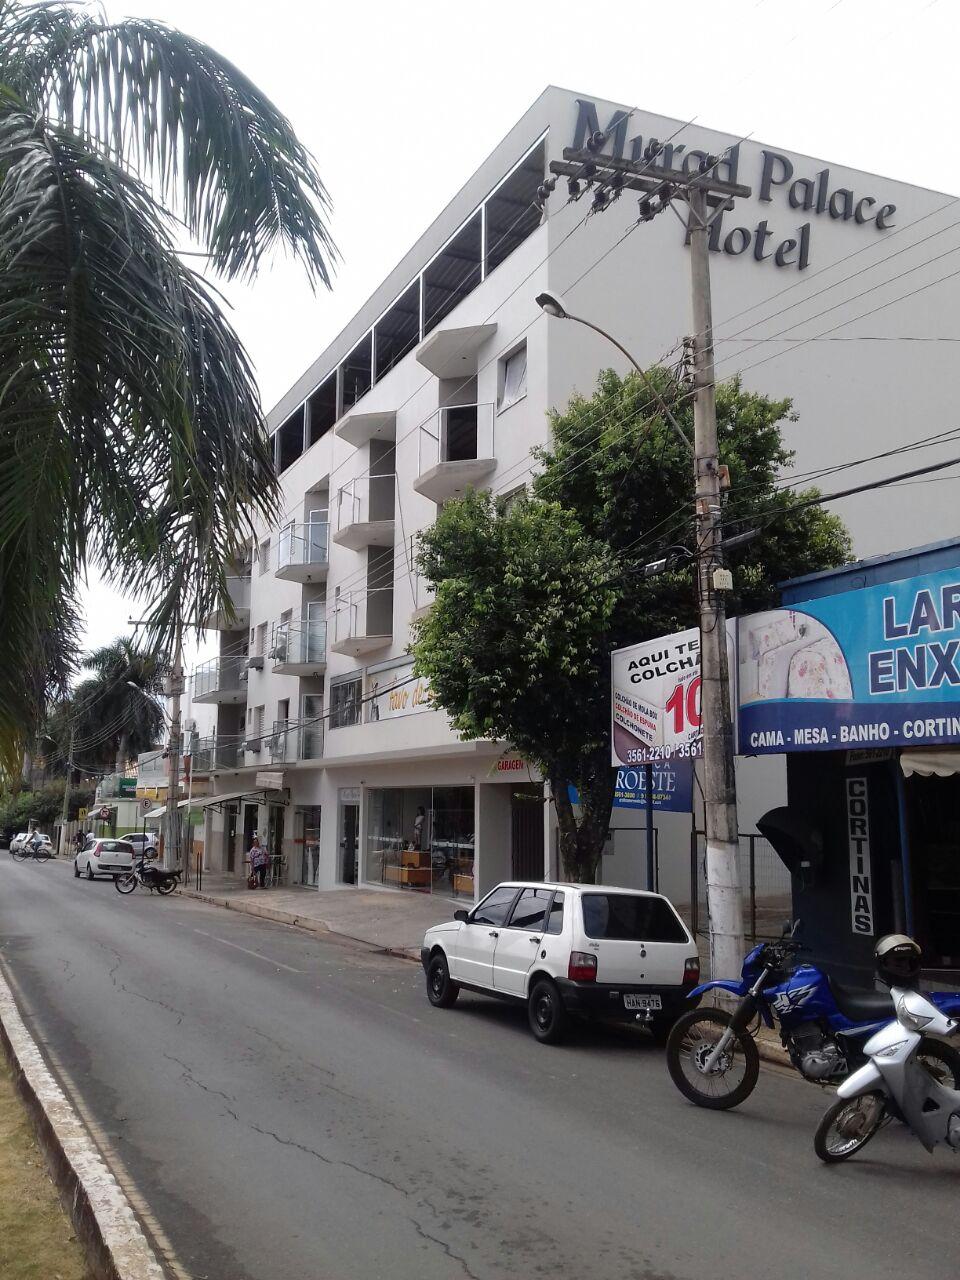 MURAD PALACE HOTEL